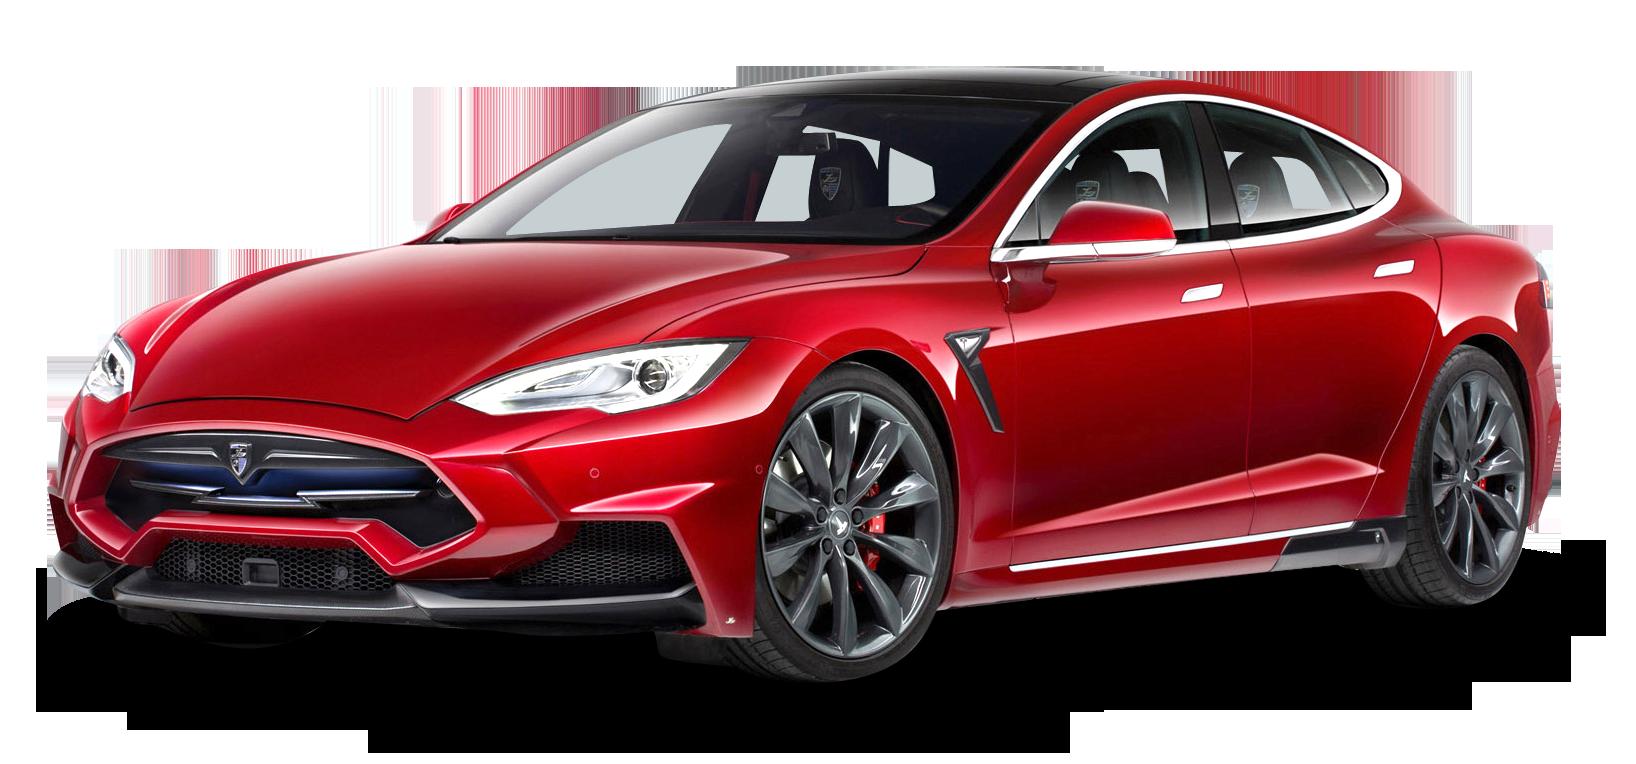 Tesla car clipart clipart freeuse stock Tesla Model S Red Car PNG Image - PurePNG   Free transparent CC0 PNG ... clipart freeuse stock